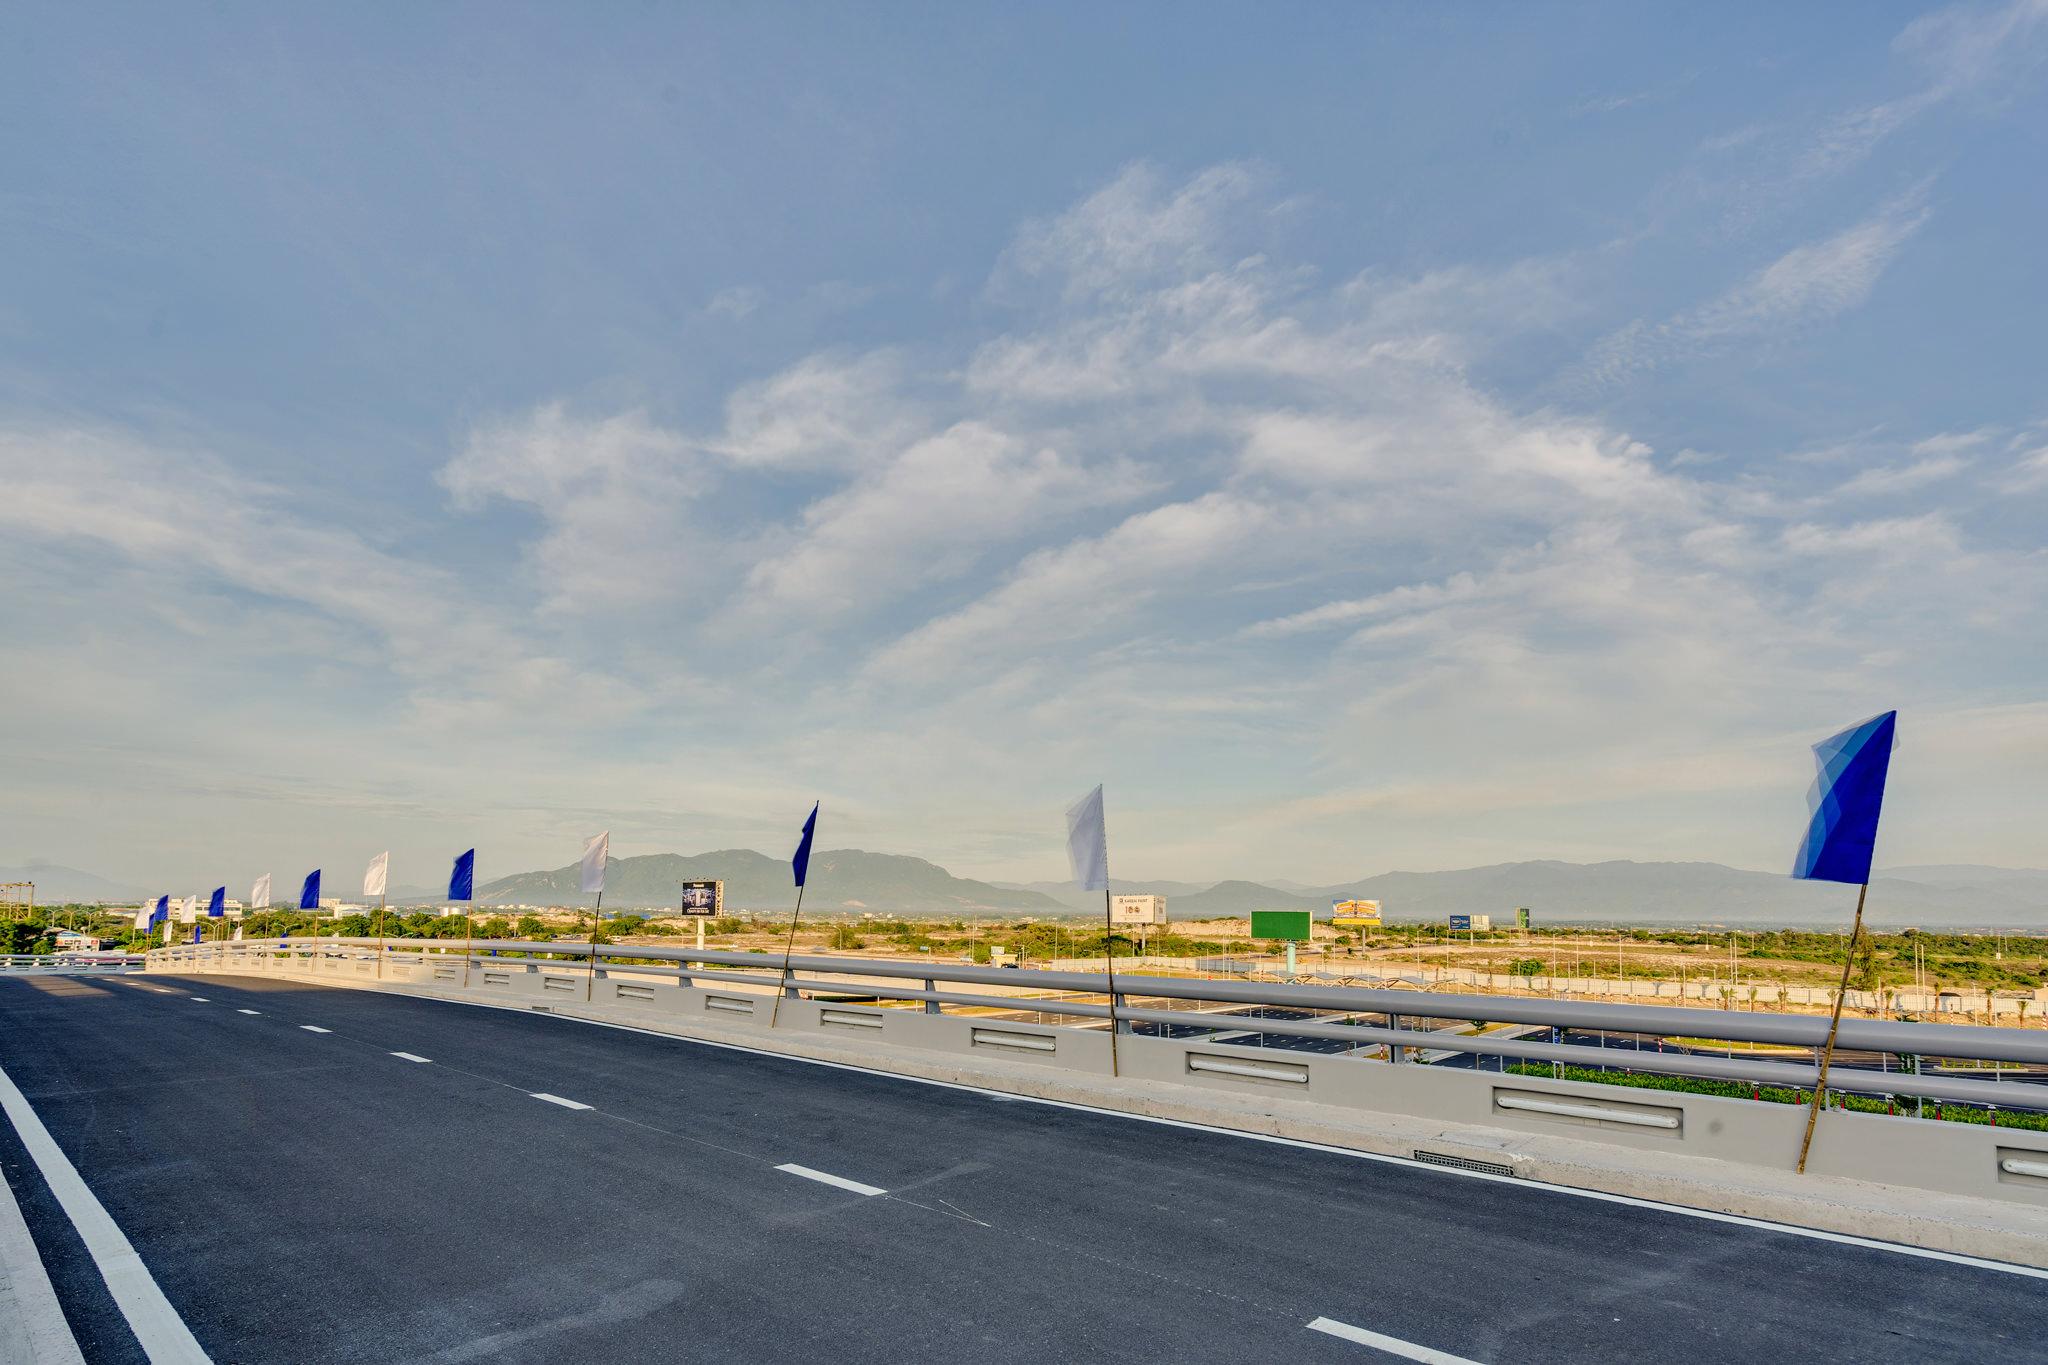 20180626 - Cam Ranh Airport - Architecture - 0087.jpg